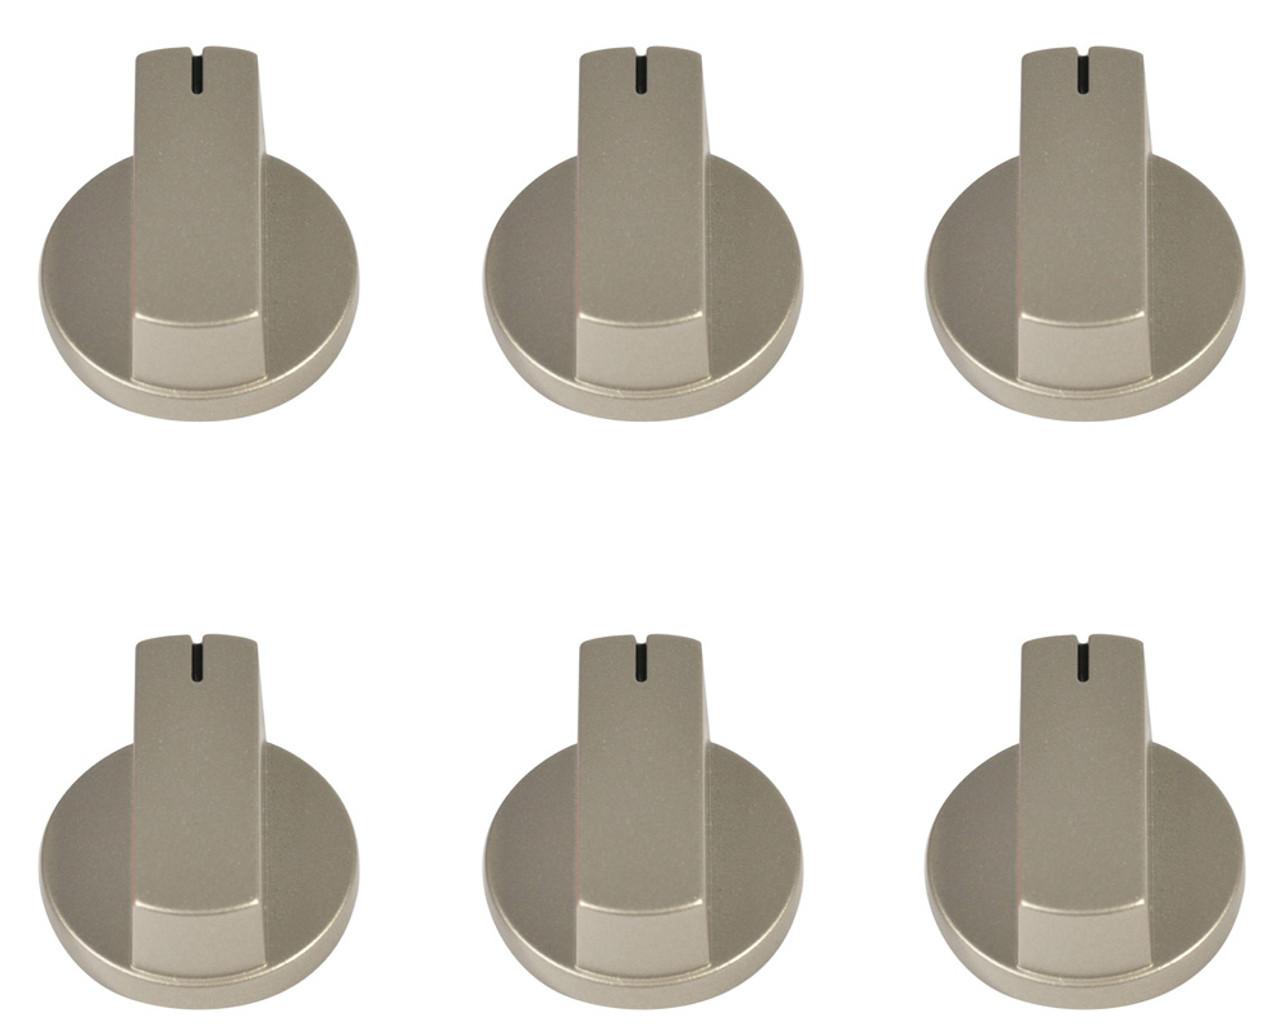 Thetford Spare Hob Control Knob 6 pack